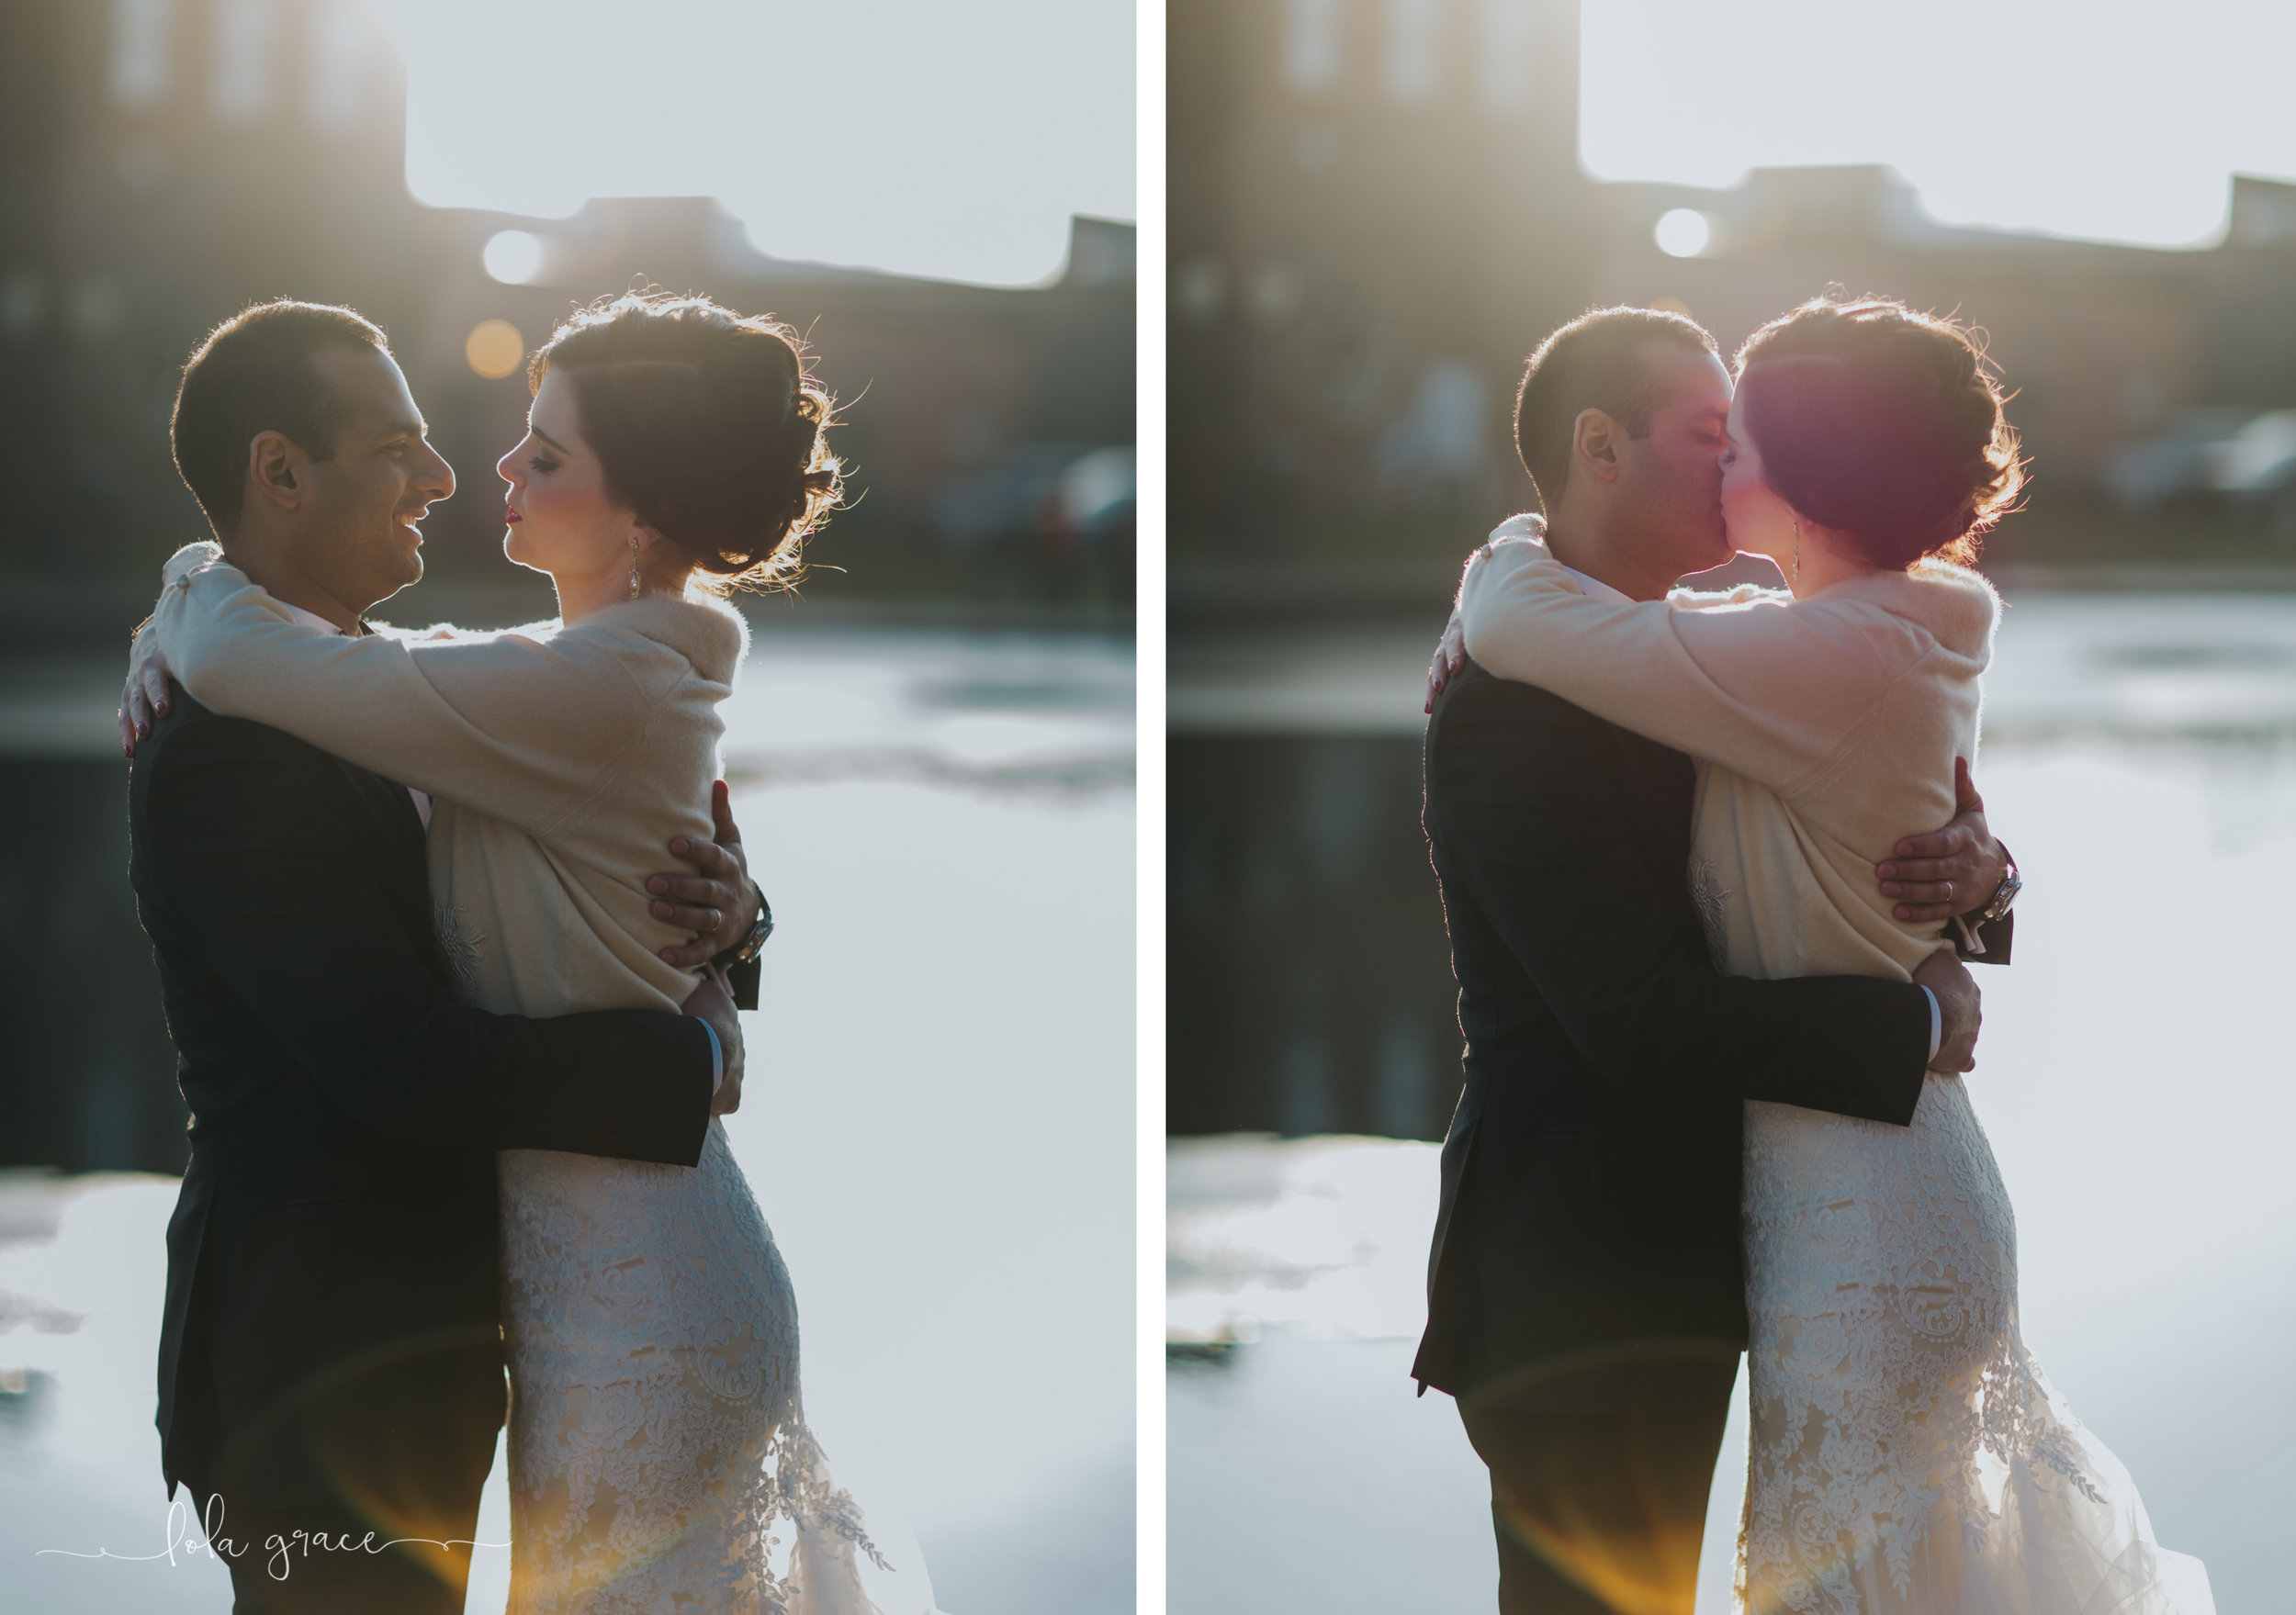 lola-grace-photography-erin-nik-brighton-mi-wedding-18.jpg